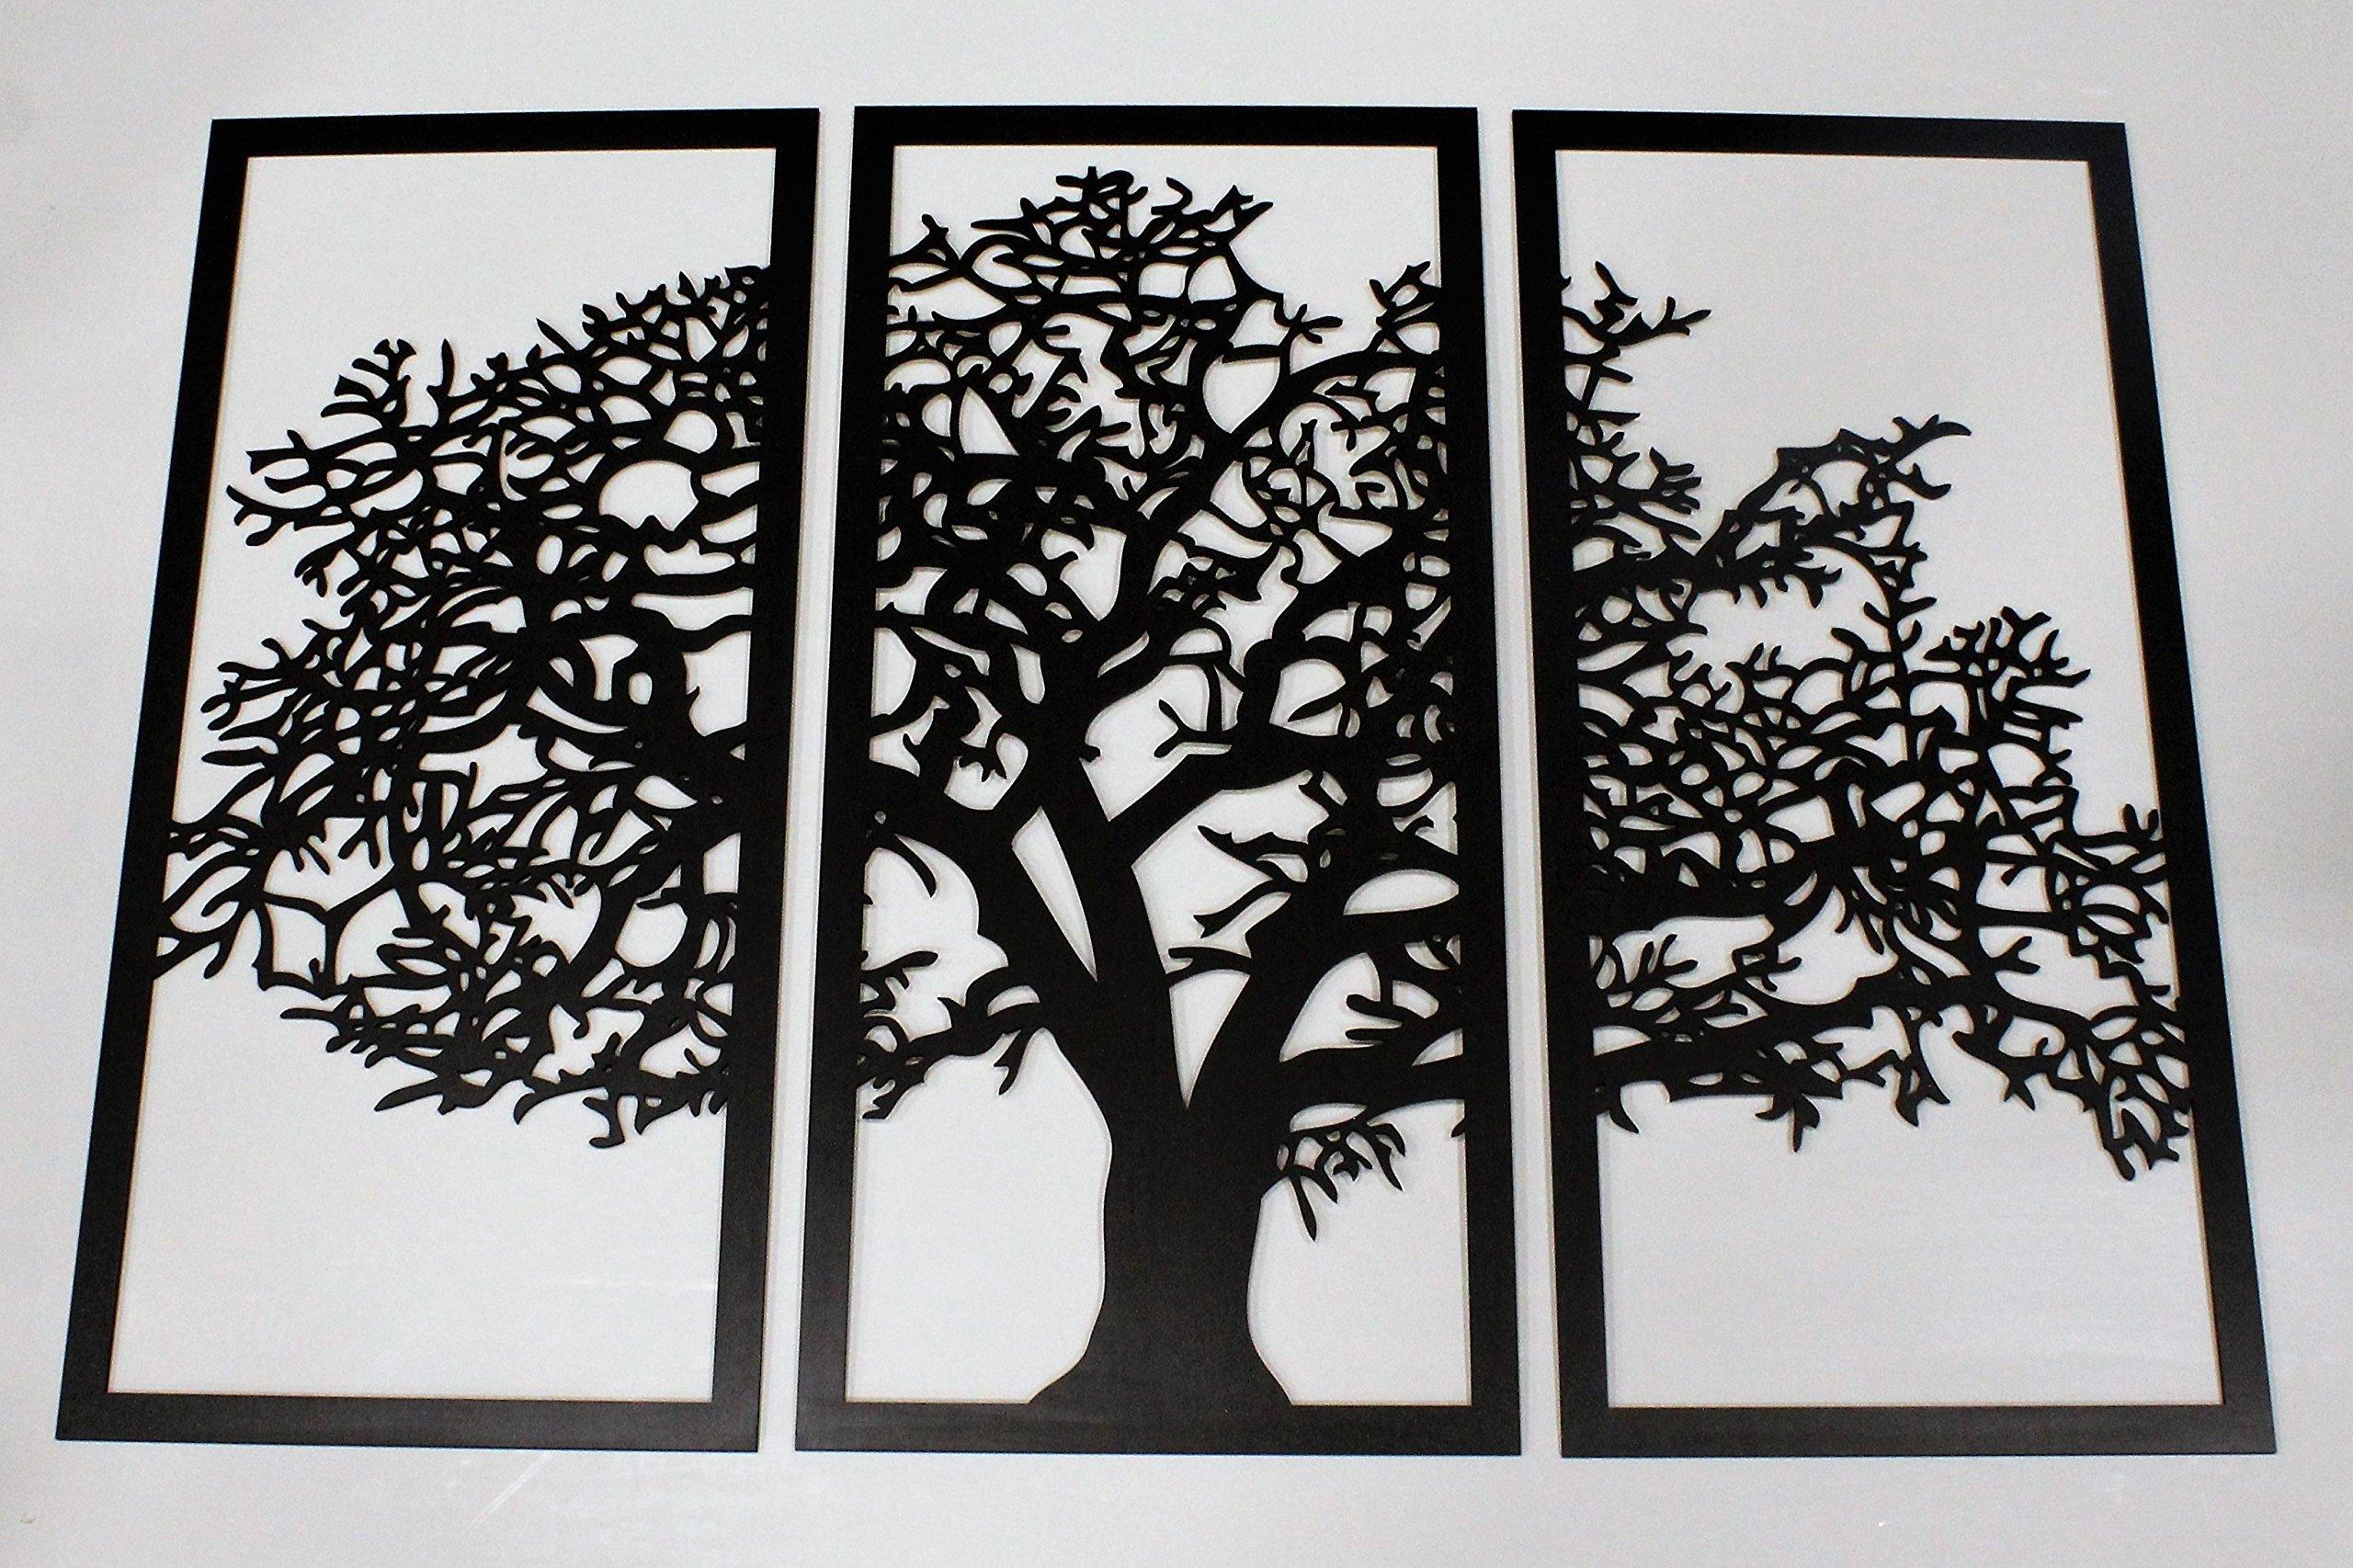 Tree of Life 3D Ebony - 3 Panel Wood Wall Art - Beautiful Living Room Decor - Skyline Workshop